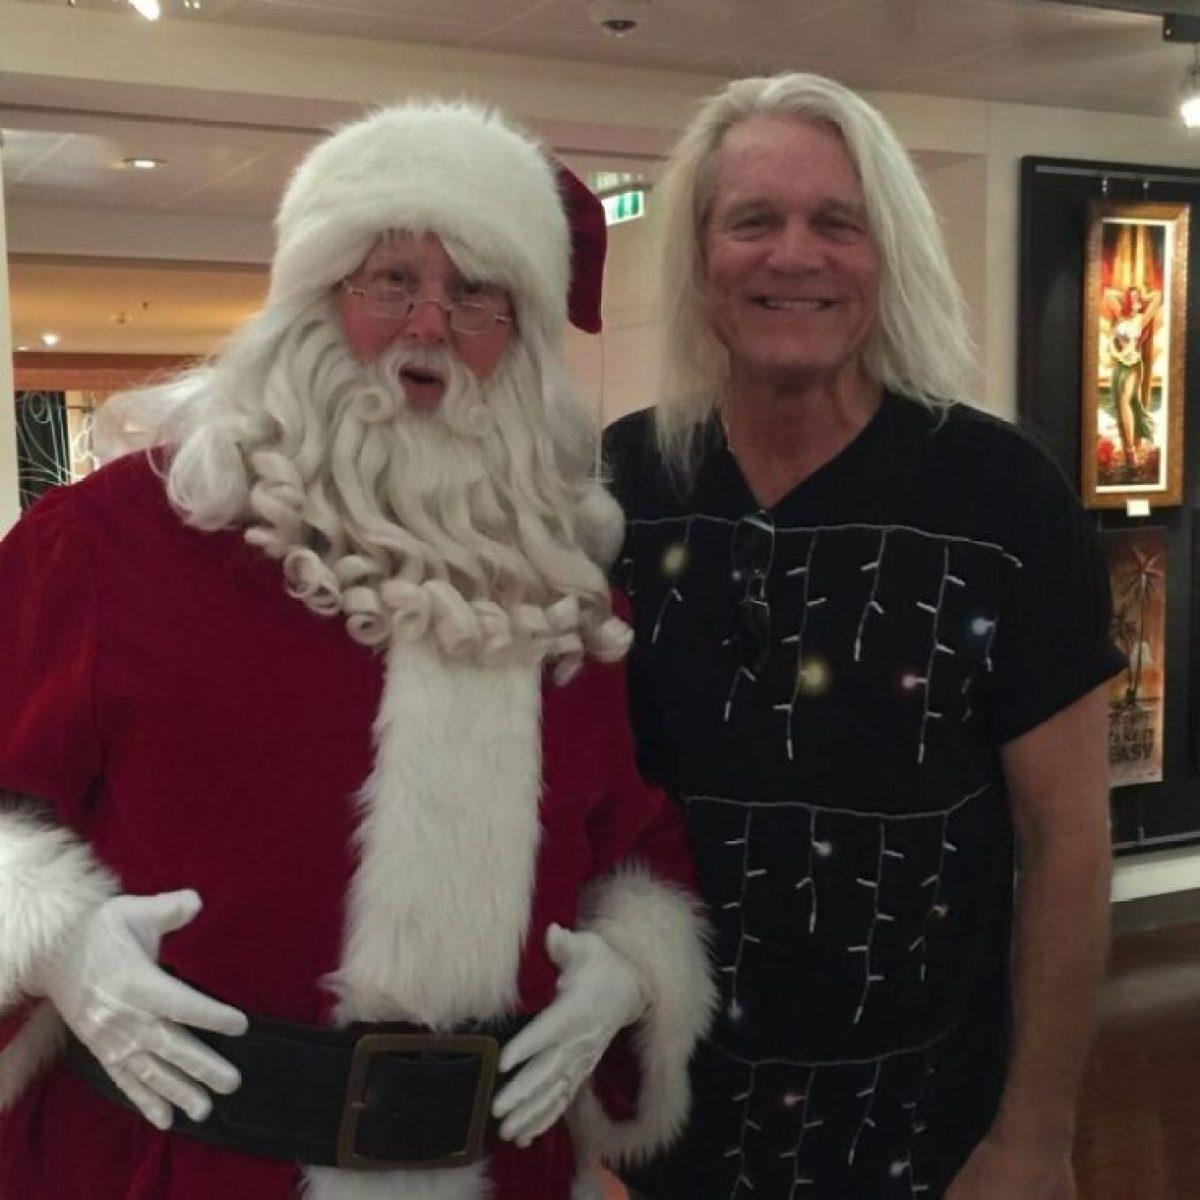 Bruce Hall with santa